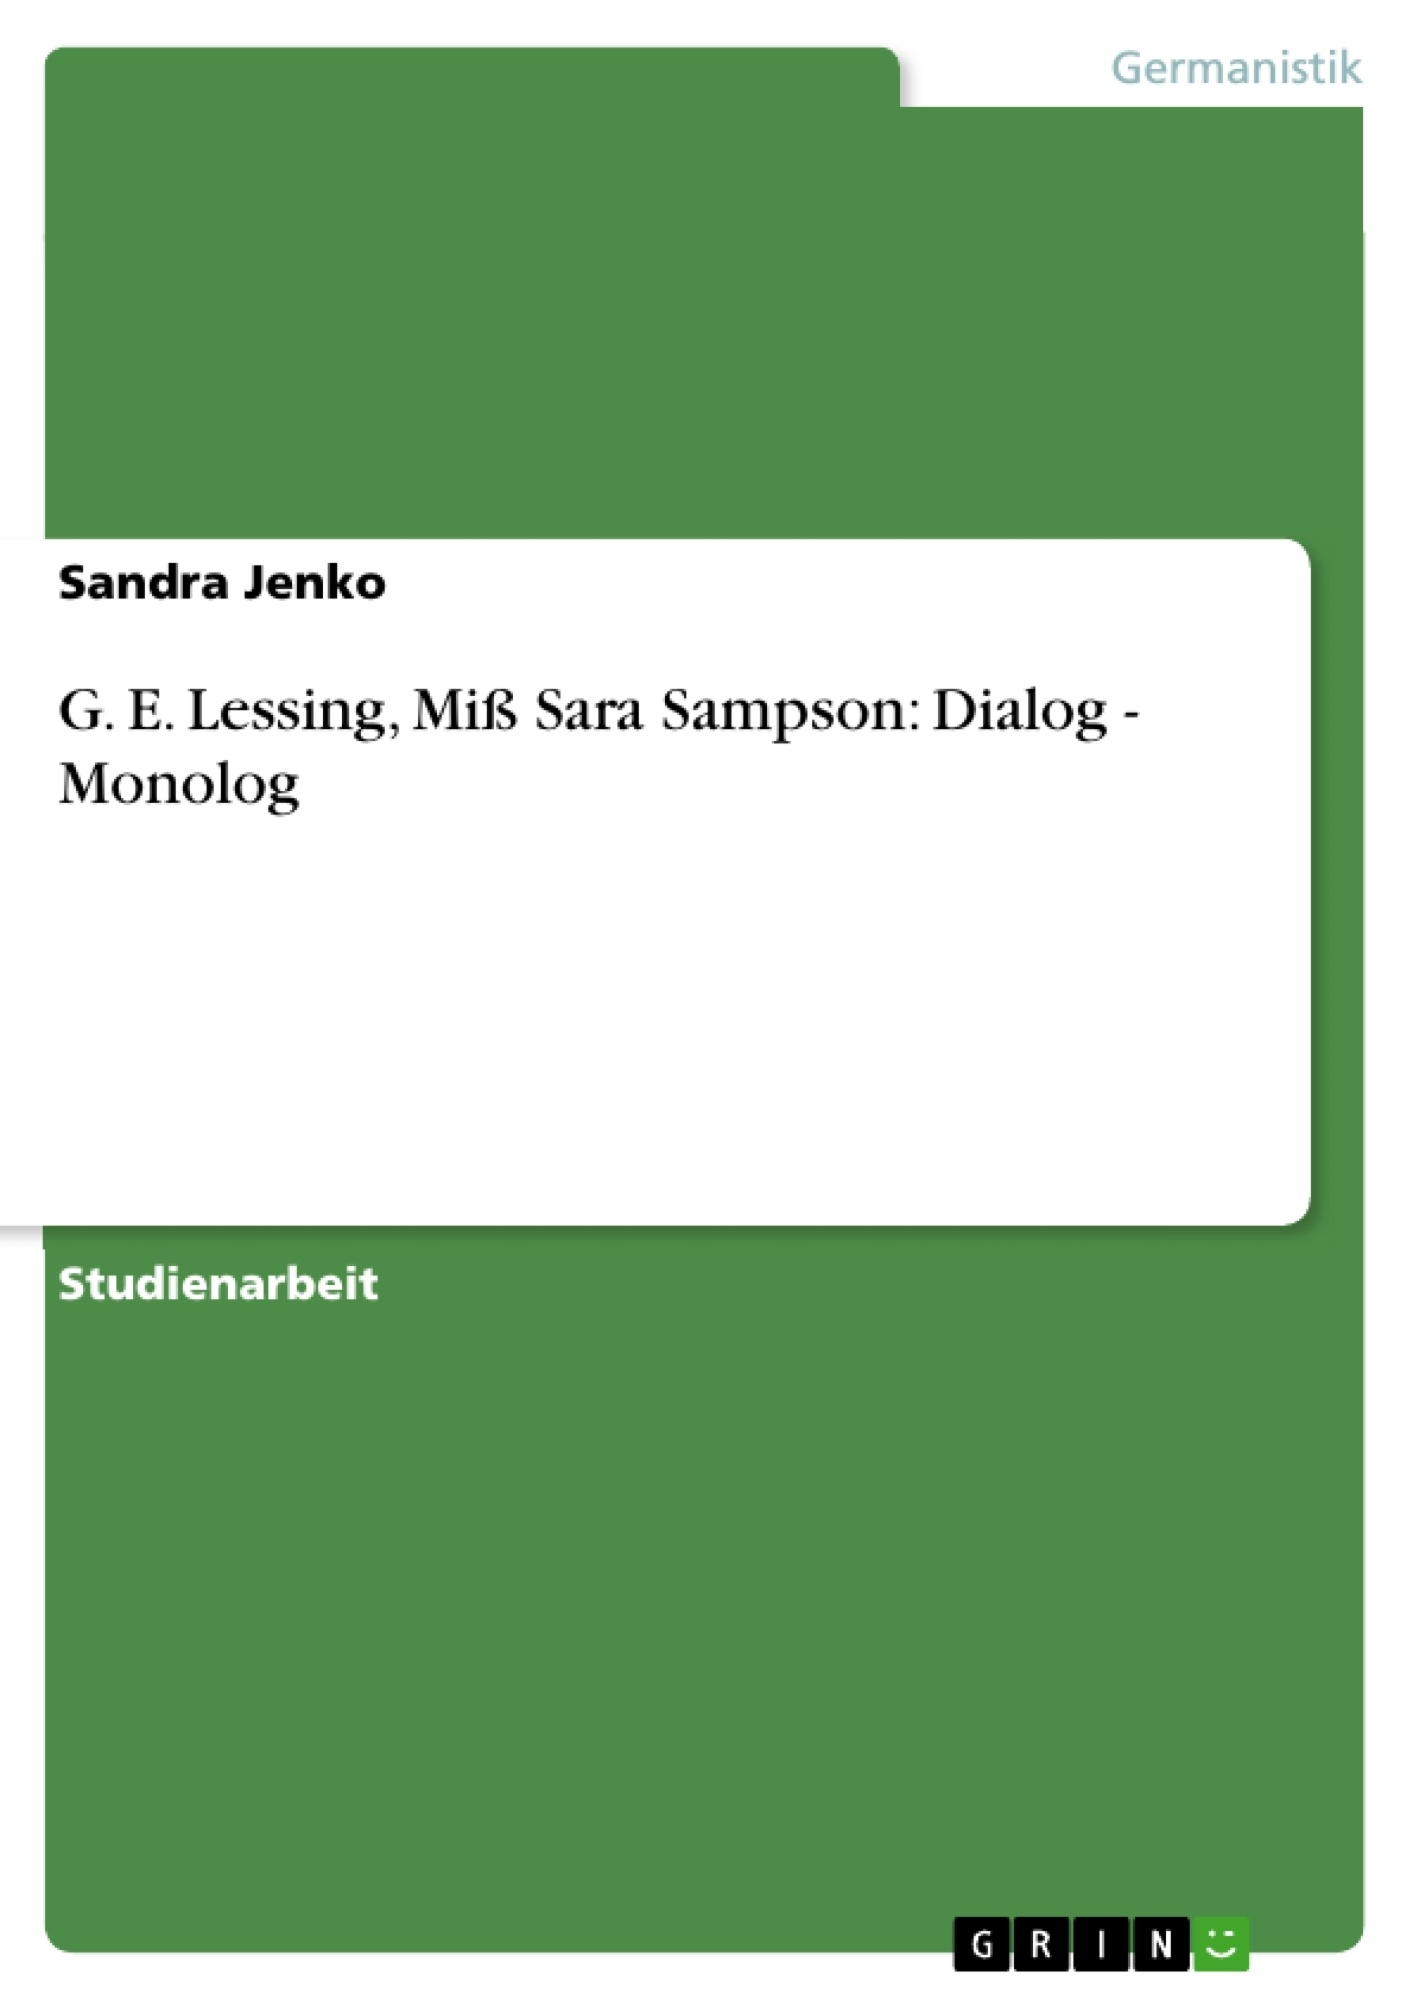 Titel: G. E. Lessing, Miß Sara Sampson: Dialog - Monolog